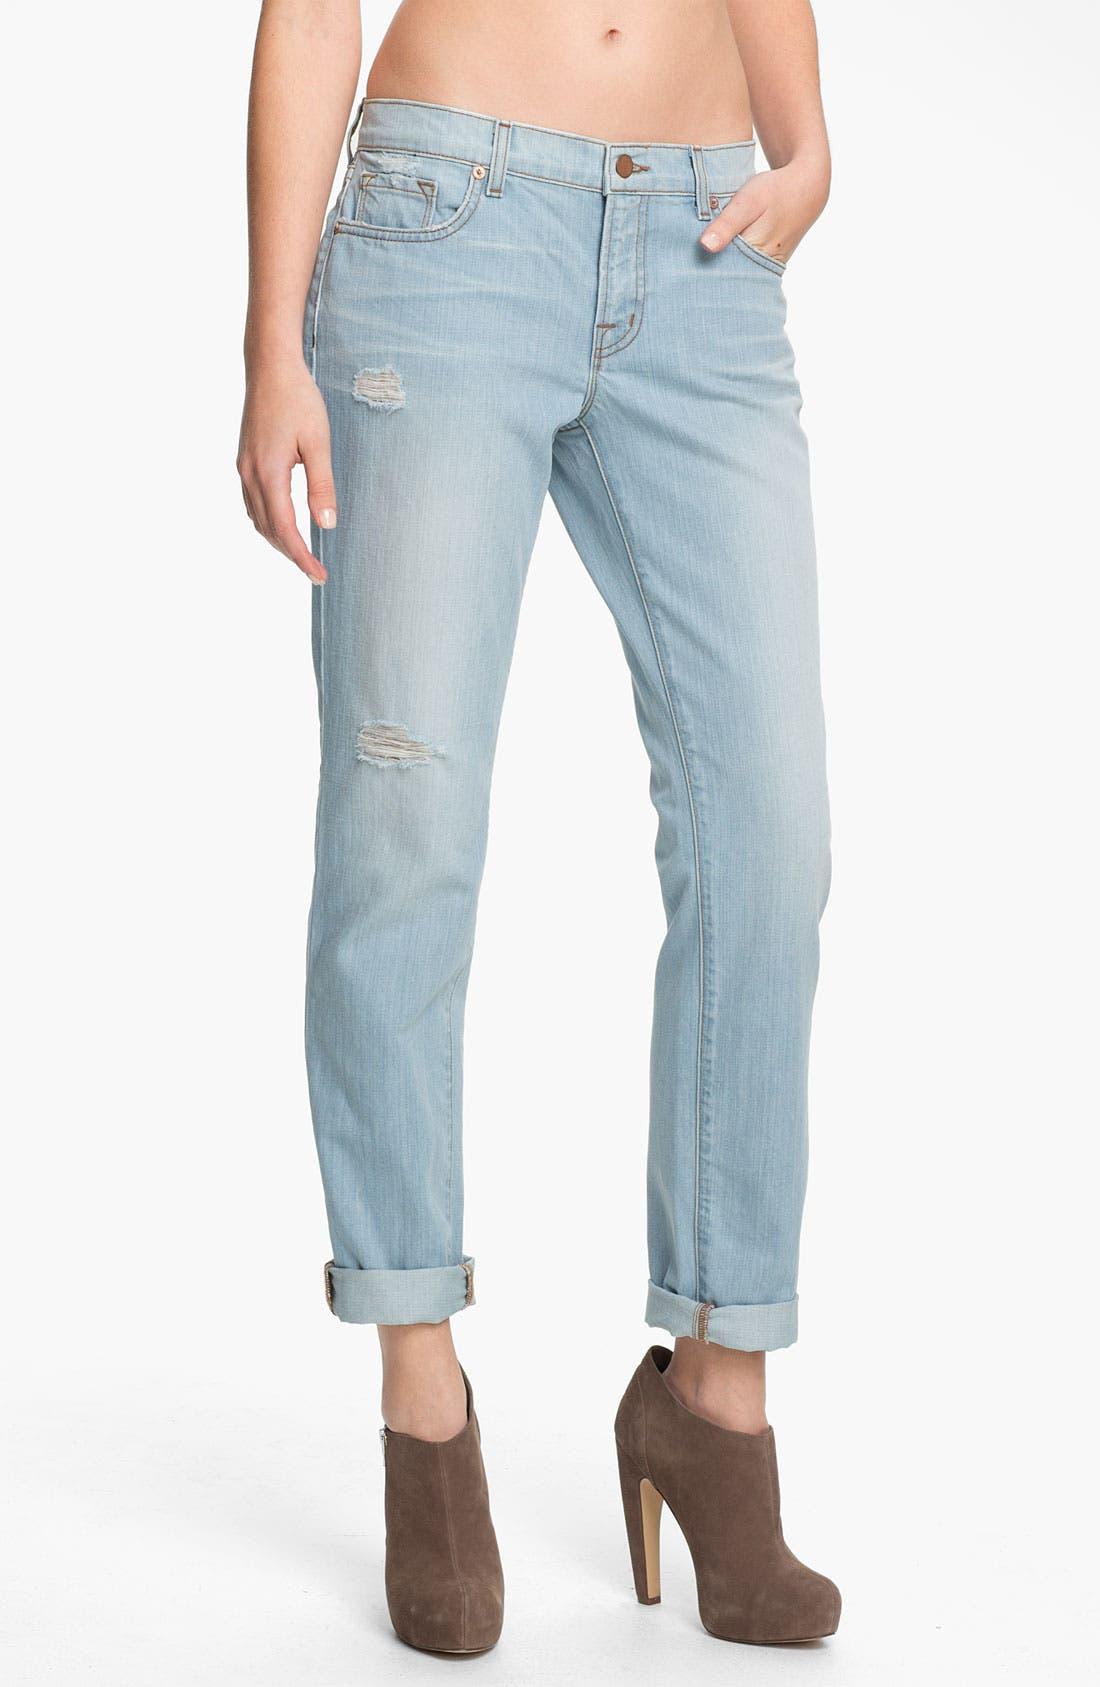 Main Image - J Brand 'Aidan' Distressed Boyfriend Fit Jeans (Illusion Destruct)